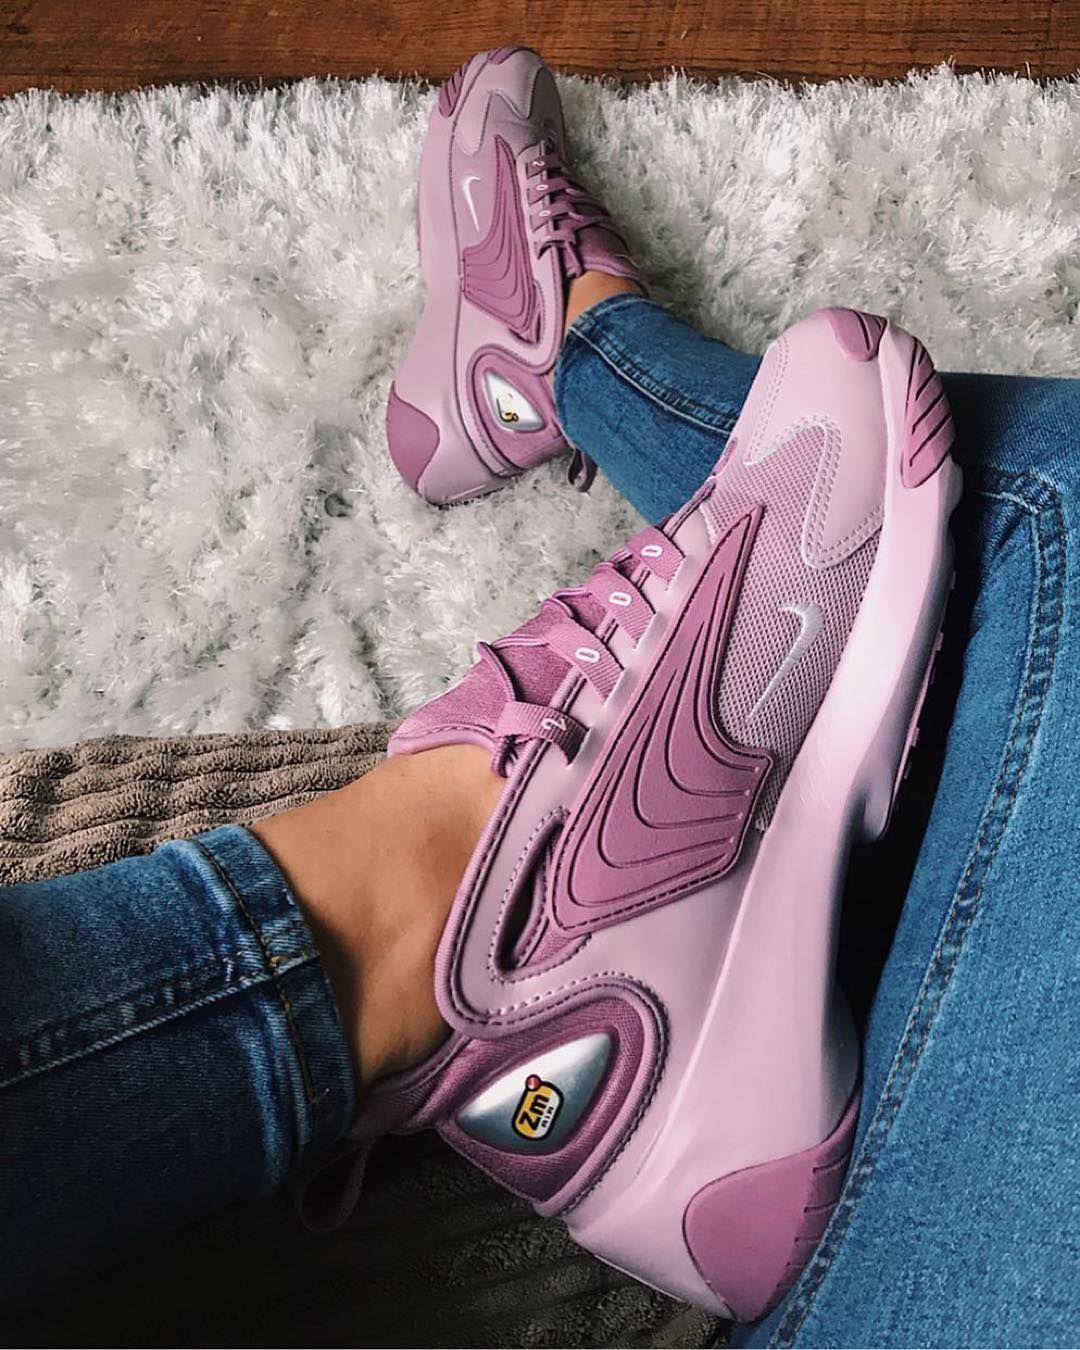 Nike Zoom 2K • @allgoodinalishood • Follow @babesnsneakers for more • #nikezoo…-#* #babesnsneakers #basementapproved #certifiedshot #chicksinkicks #crepecity #girlsonmyfeet #hskicks #hypebae #hypebaekicks #hypefeet #hypelife #igkicks #klekttakeover #lacedupshots #luxury #Nike #nikewomen #nikezoom #nikezoom2k #sneakerfreaker #sneakersaddict #snkraddicted #trocsneakers #weartga #whatsurgirlwearing #wissk7